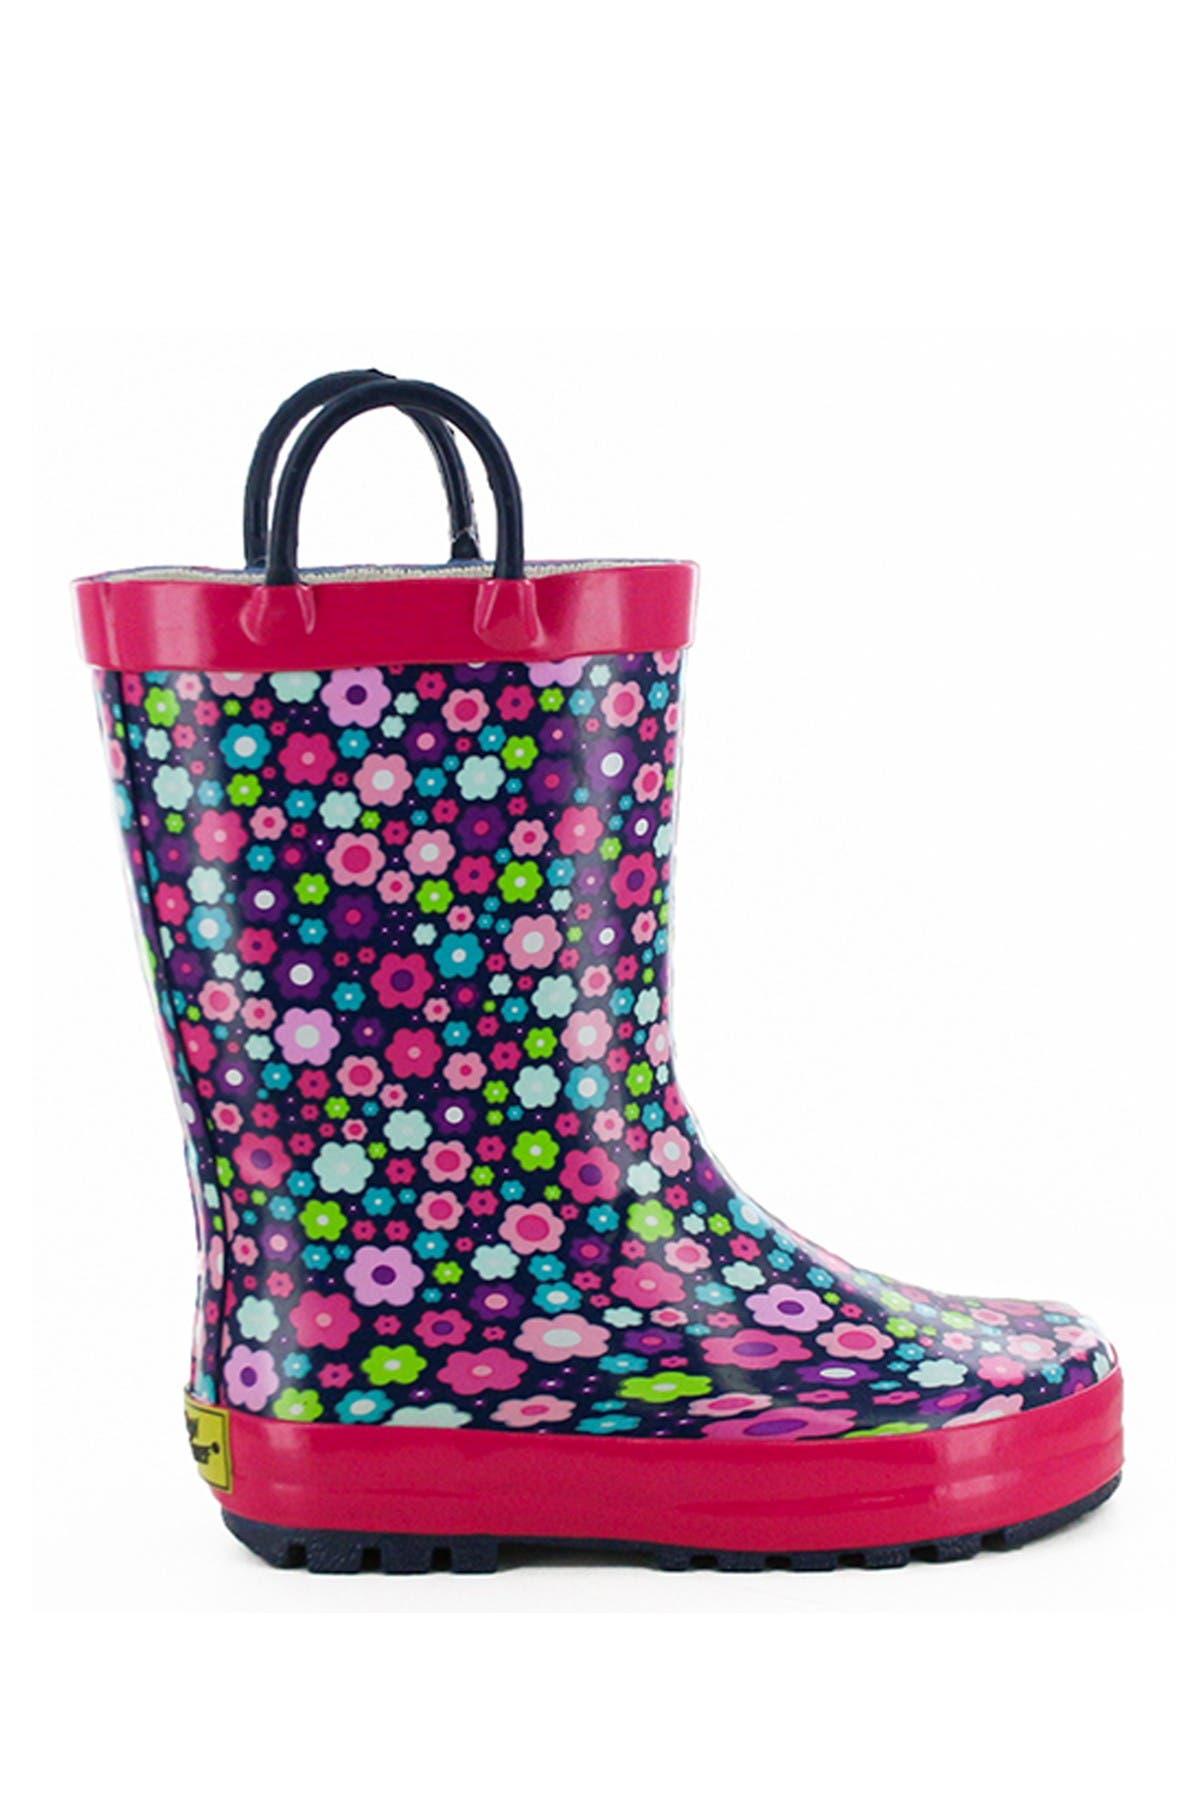 Western Chief Blossom Blast Waterproof Rain Boot